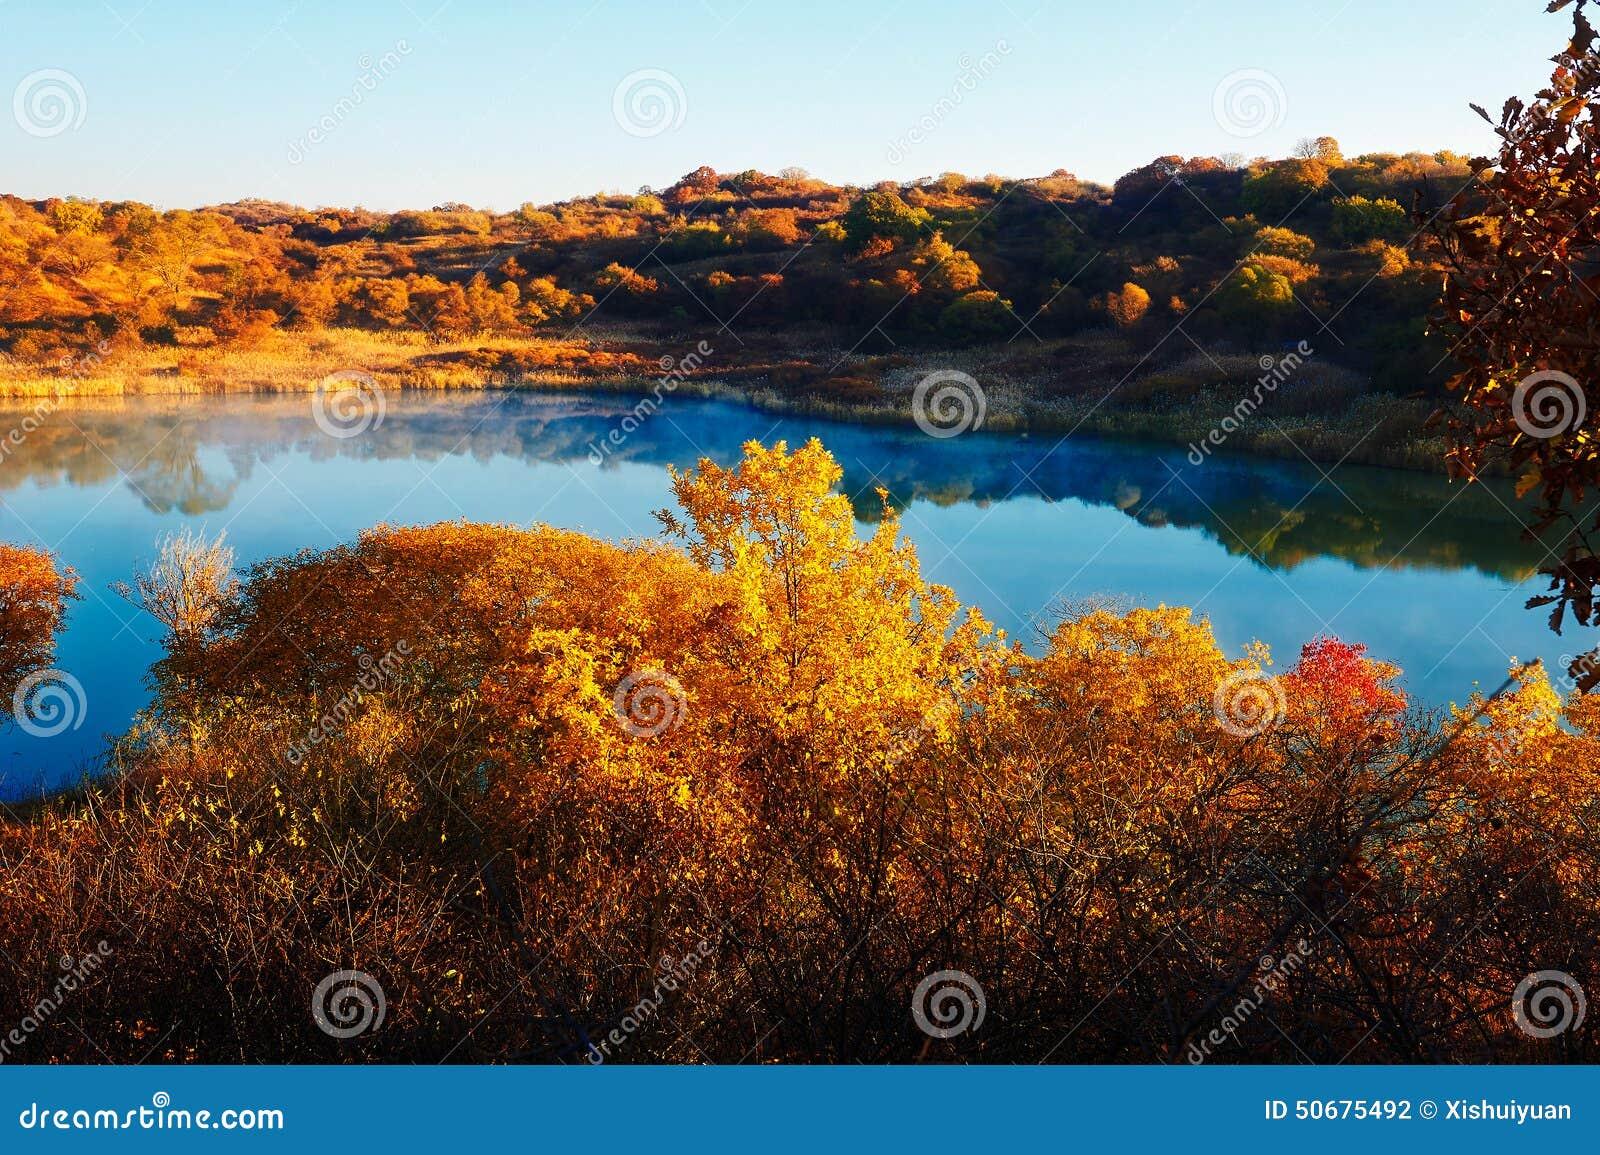 Download 深蓝湖和秋天树 库存照片. 图片 包括有 ,并且, 自治权, 航空, 蓝绿色, 红色, 日落, 森林, 小船 - 50675492